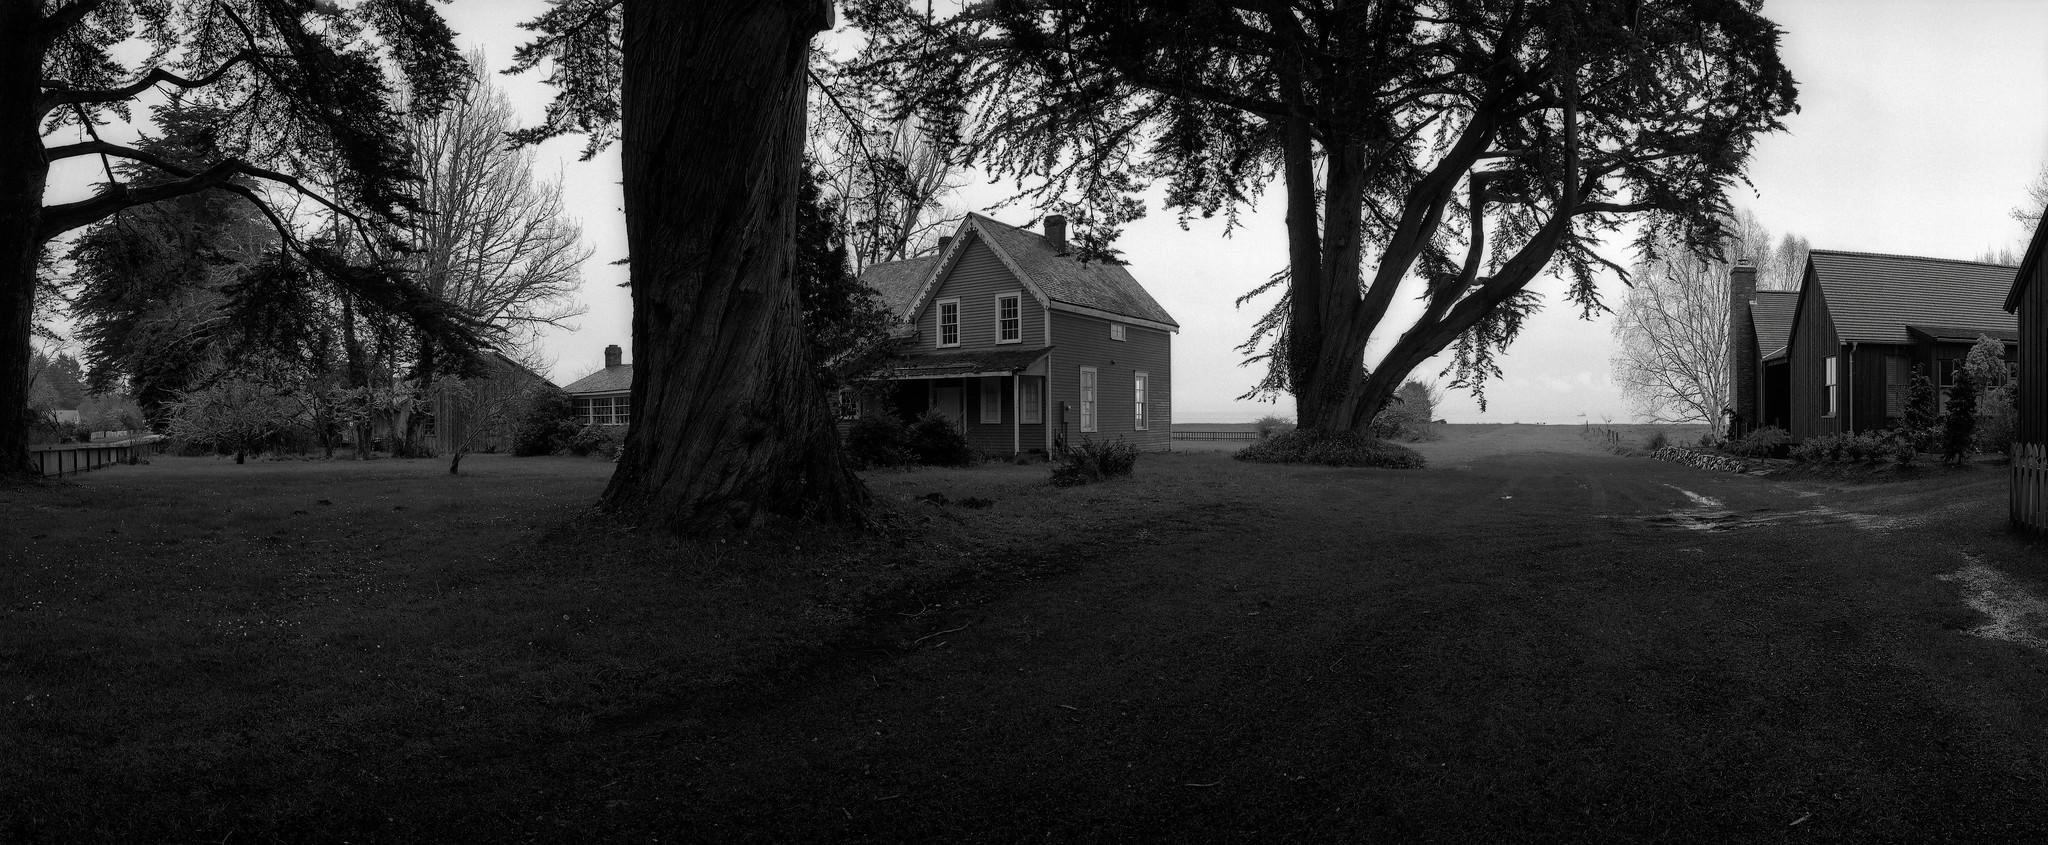 Oysterville, Washington | by austin granger